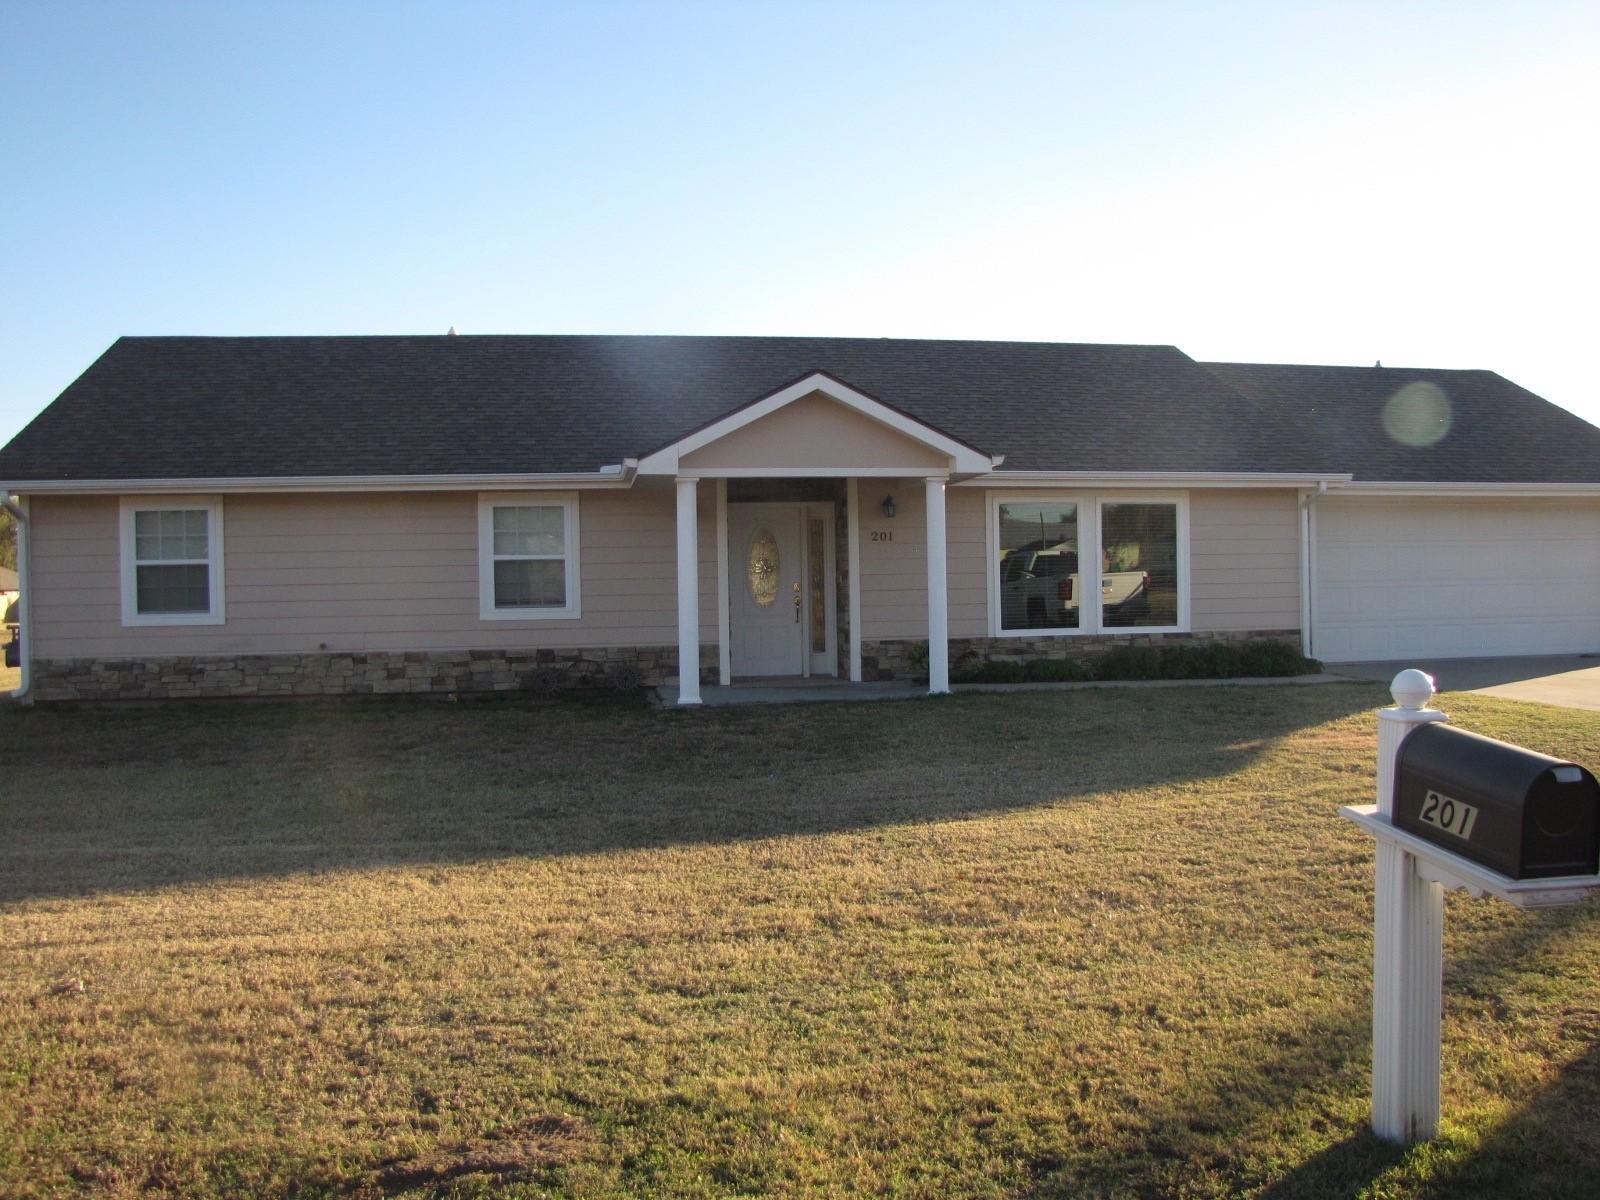 201 E 3rd Ave, South Hutchinson, Kansas 67505